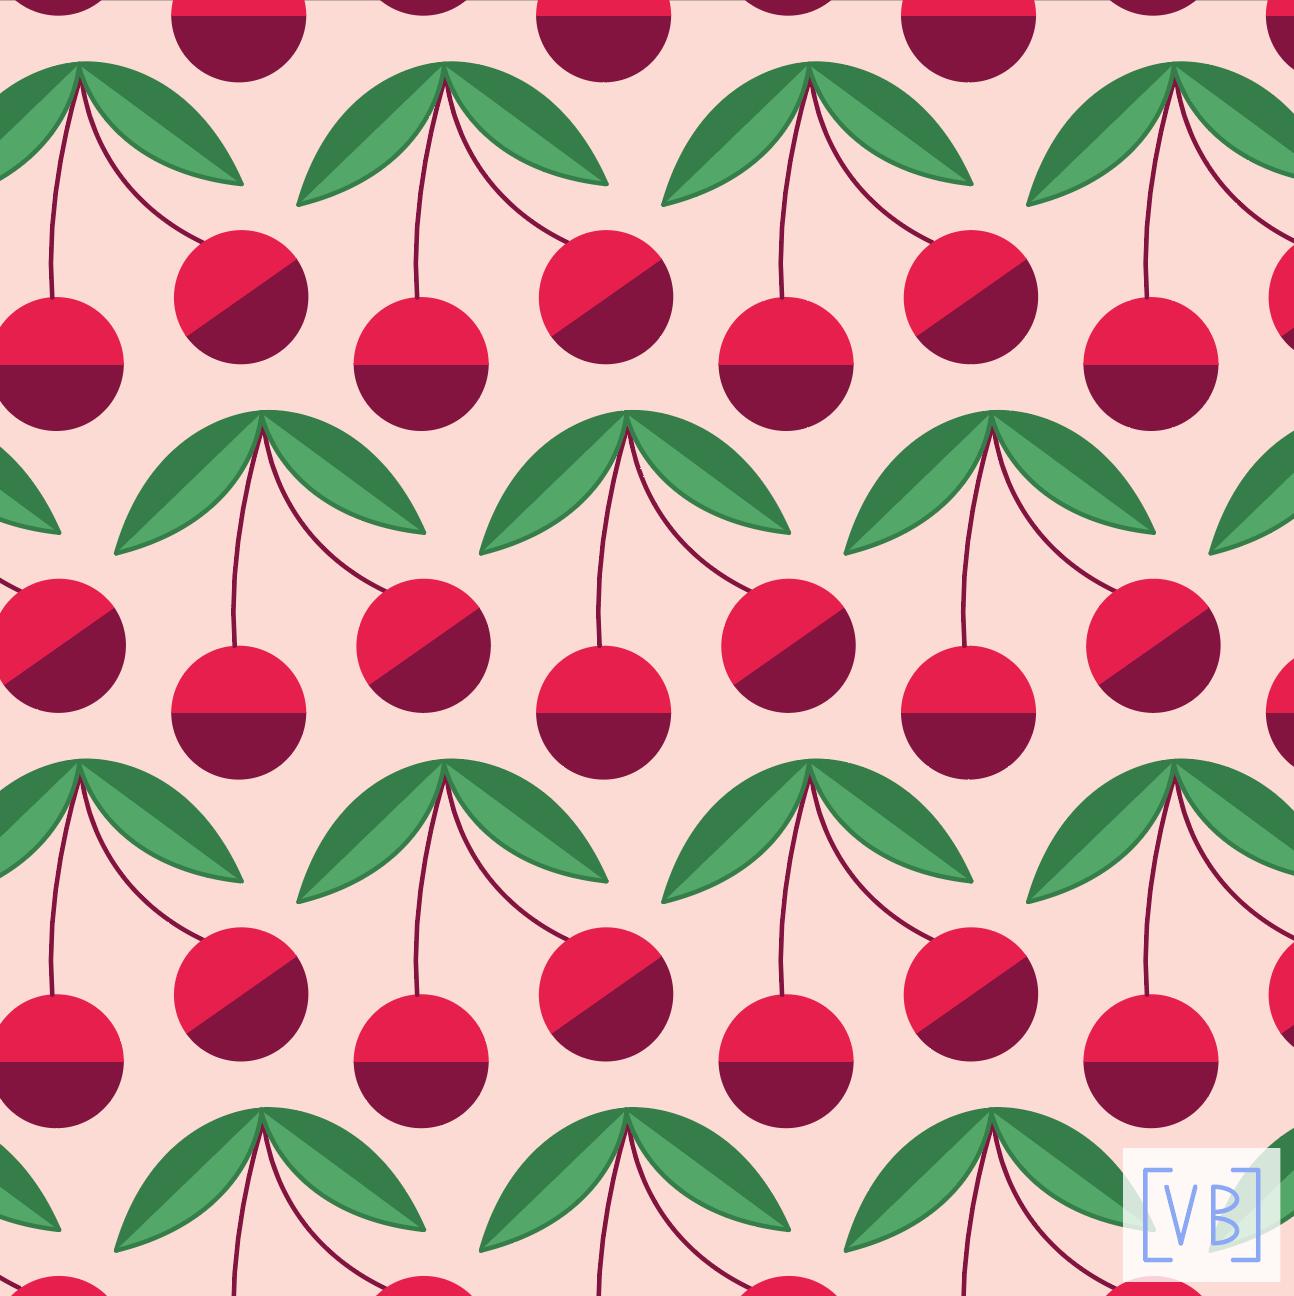 06.03.16_cherries.png